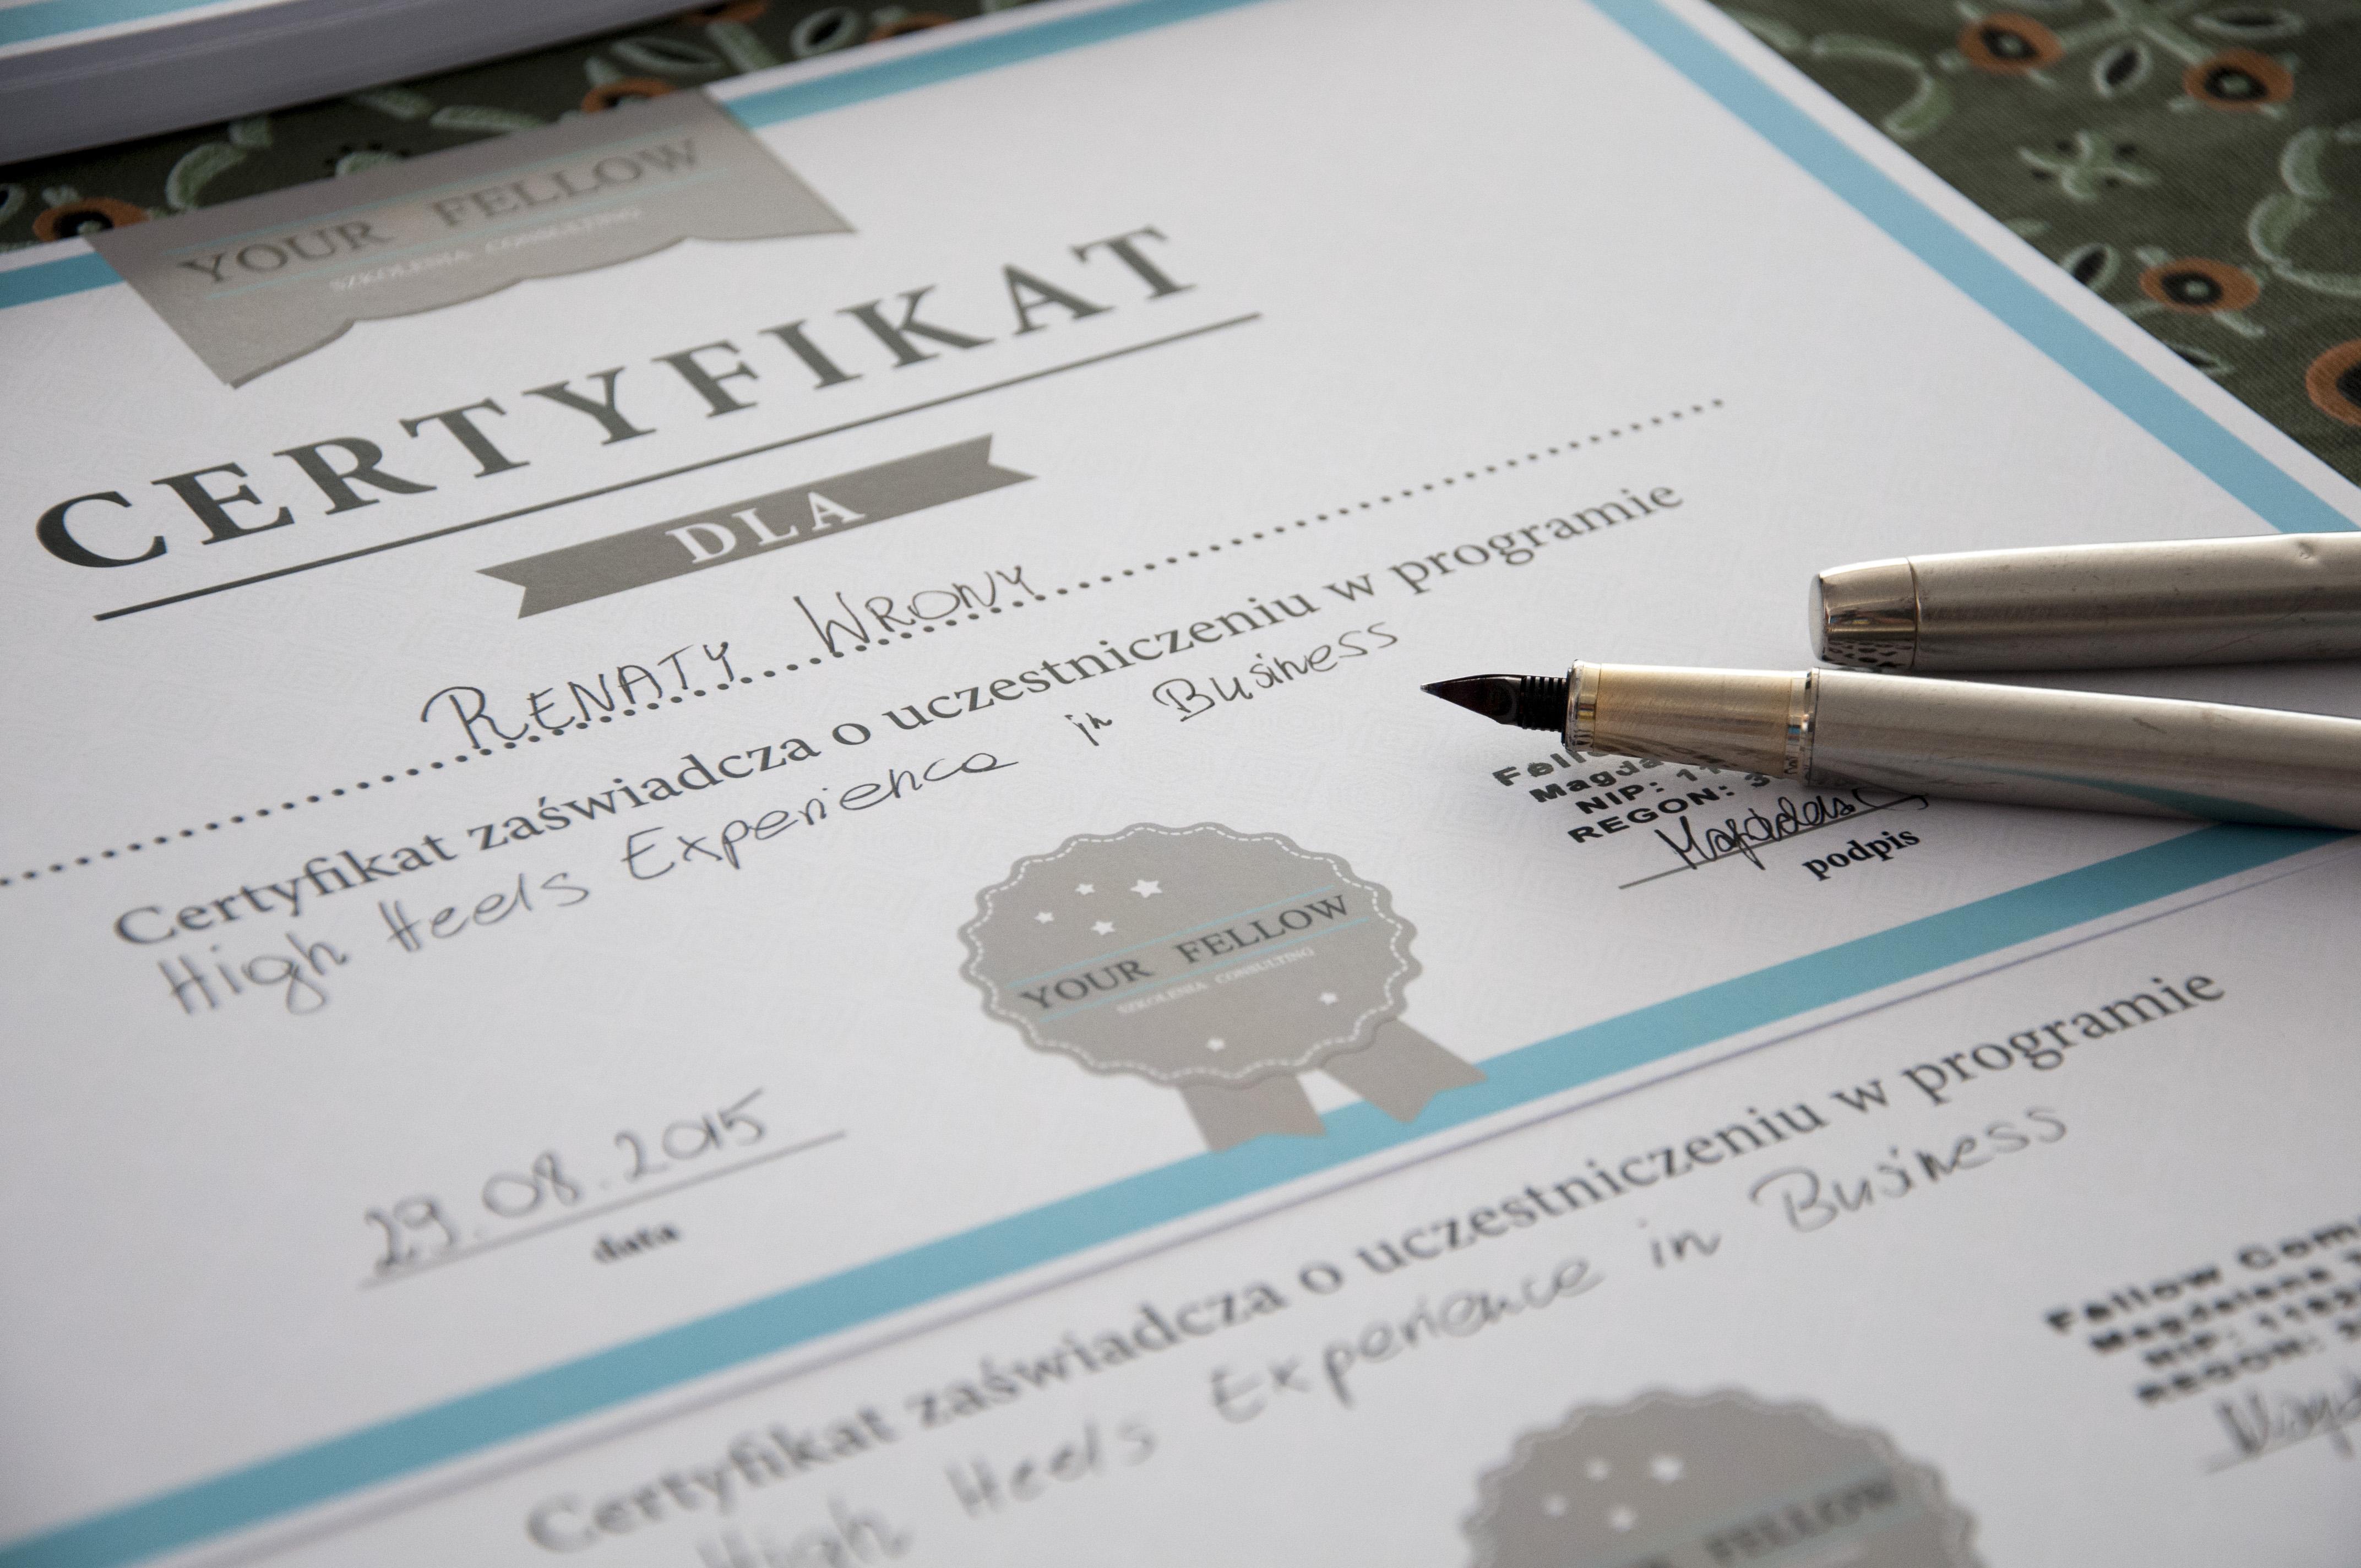 Certyfikat uczestnika.